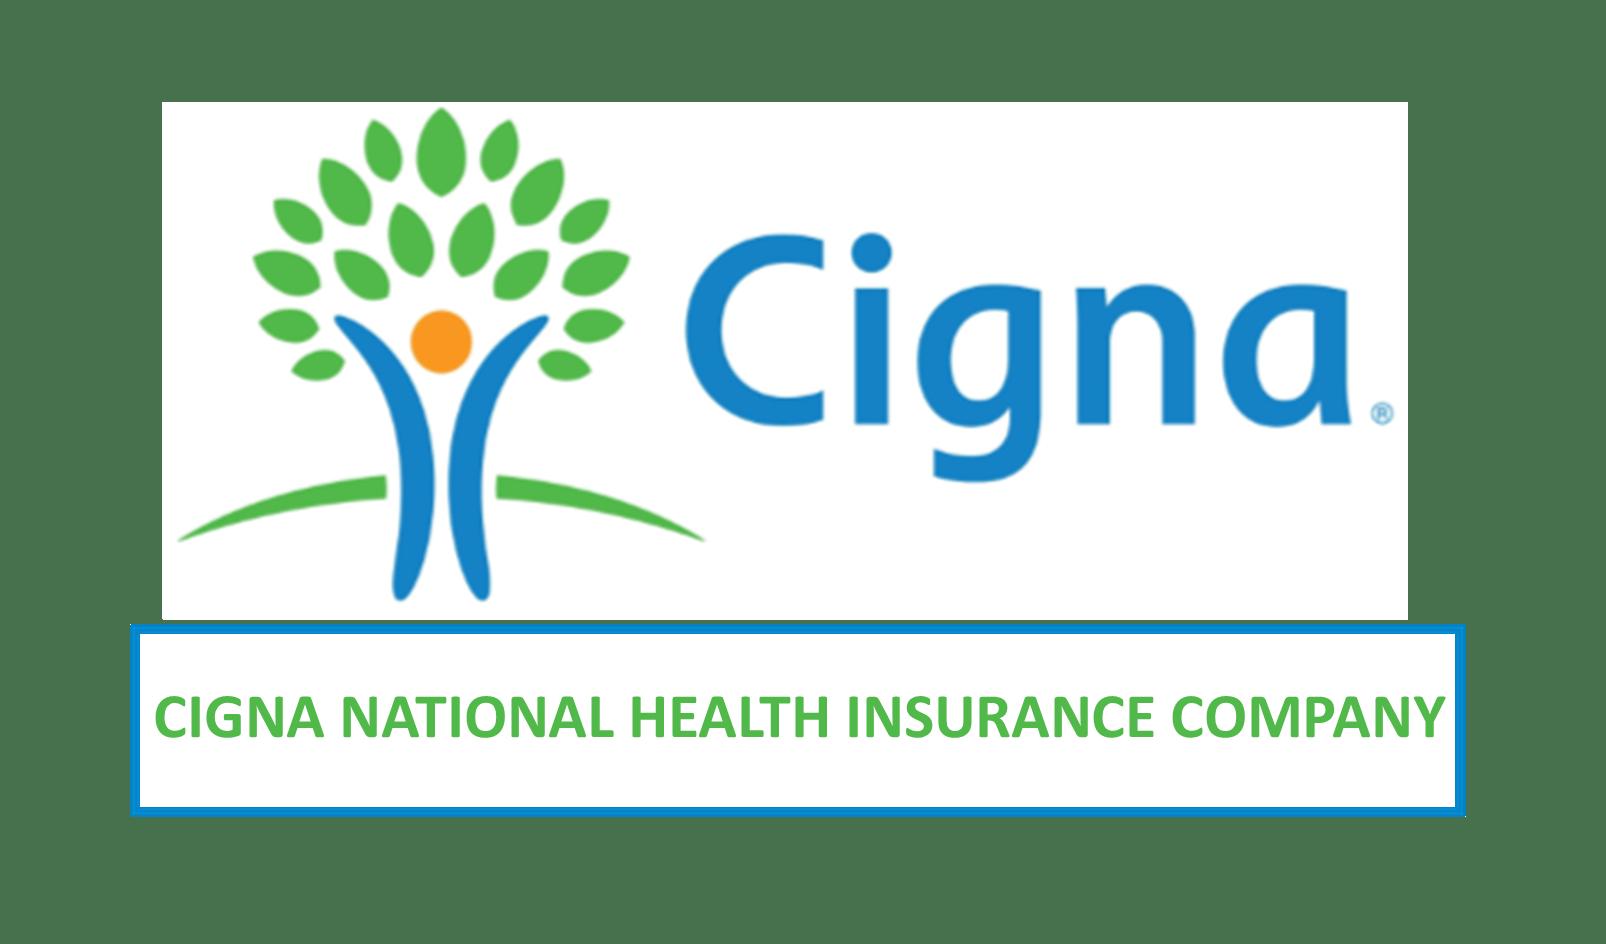 cigna health insurance logo for senior marketing specialists medicare FMO